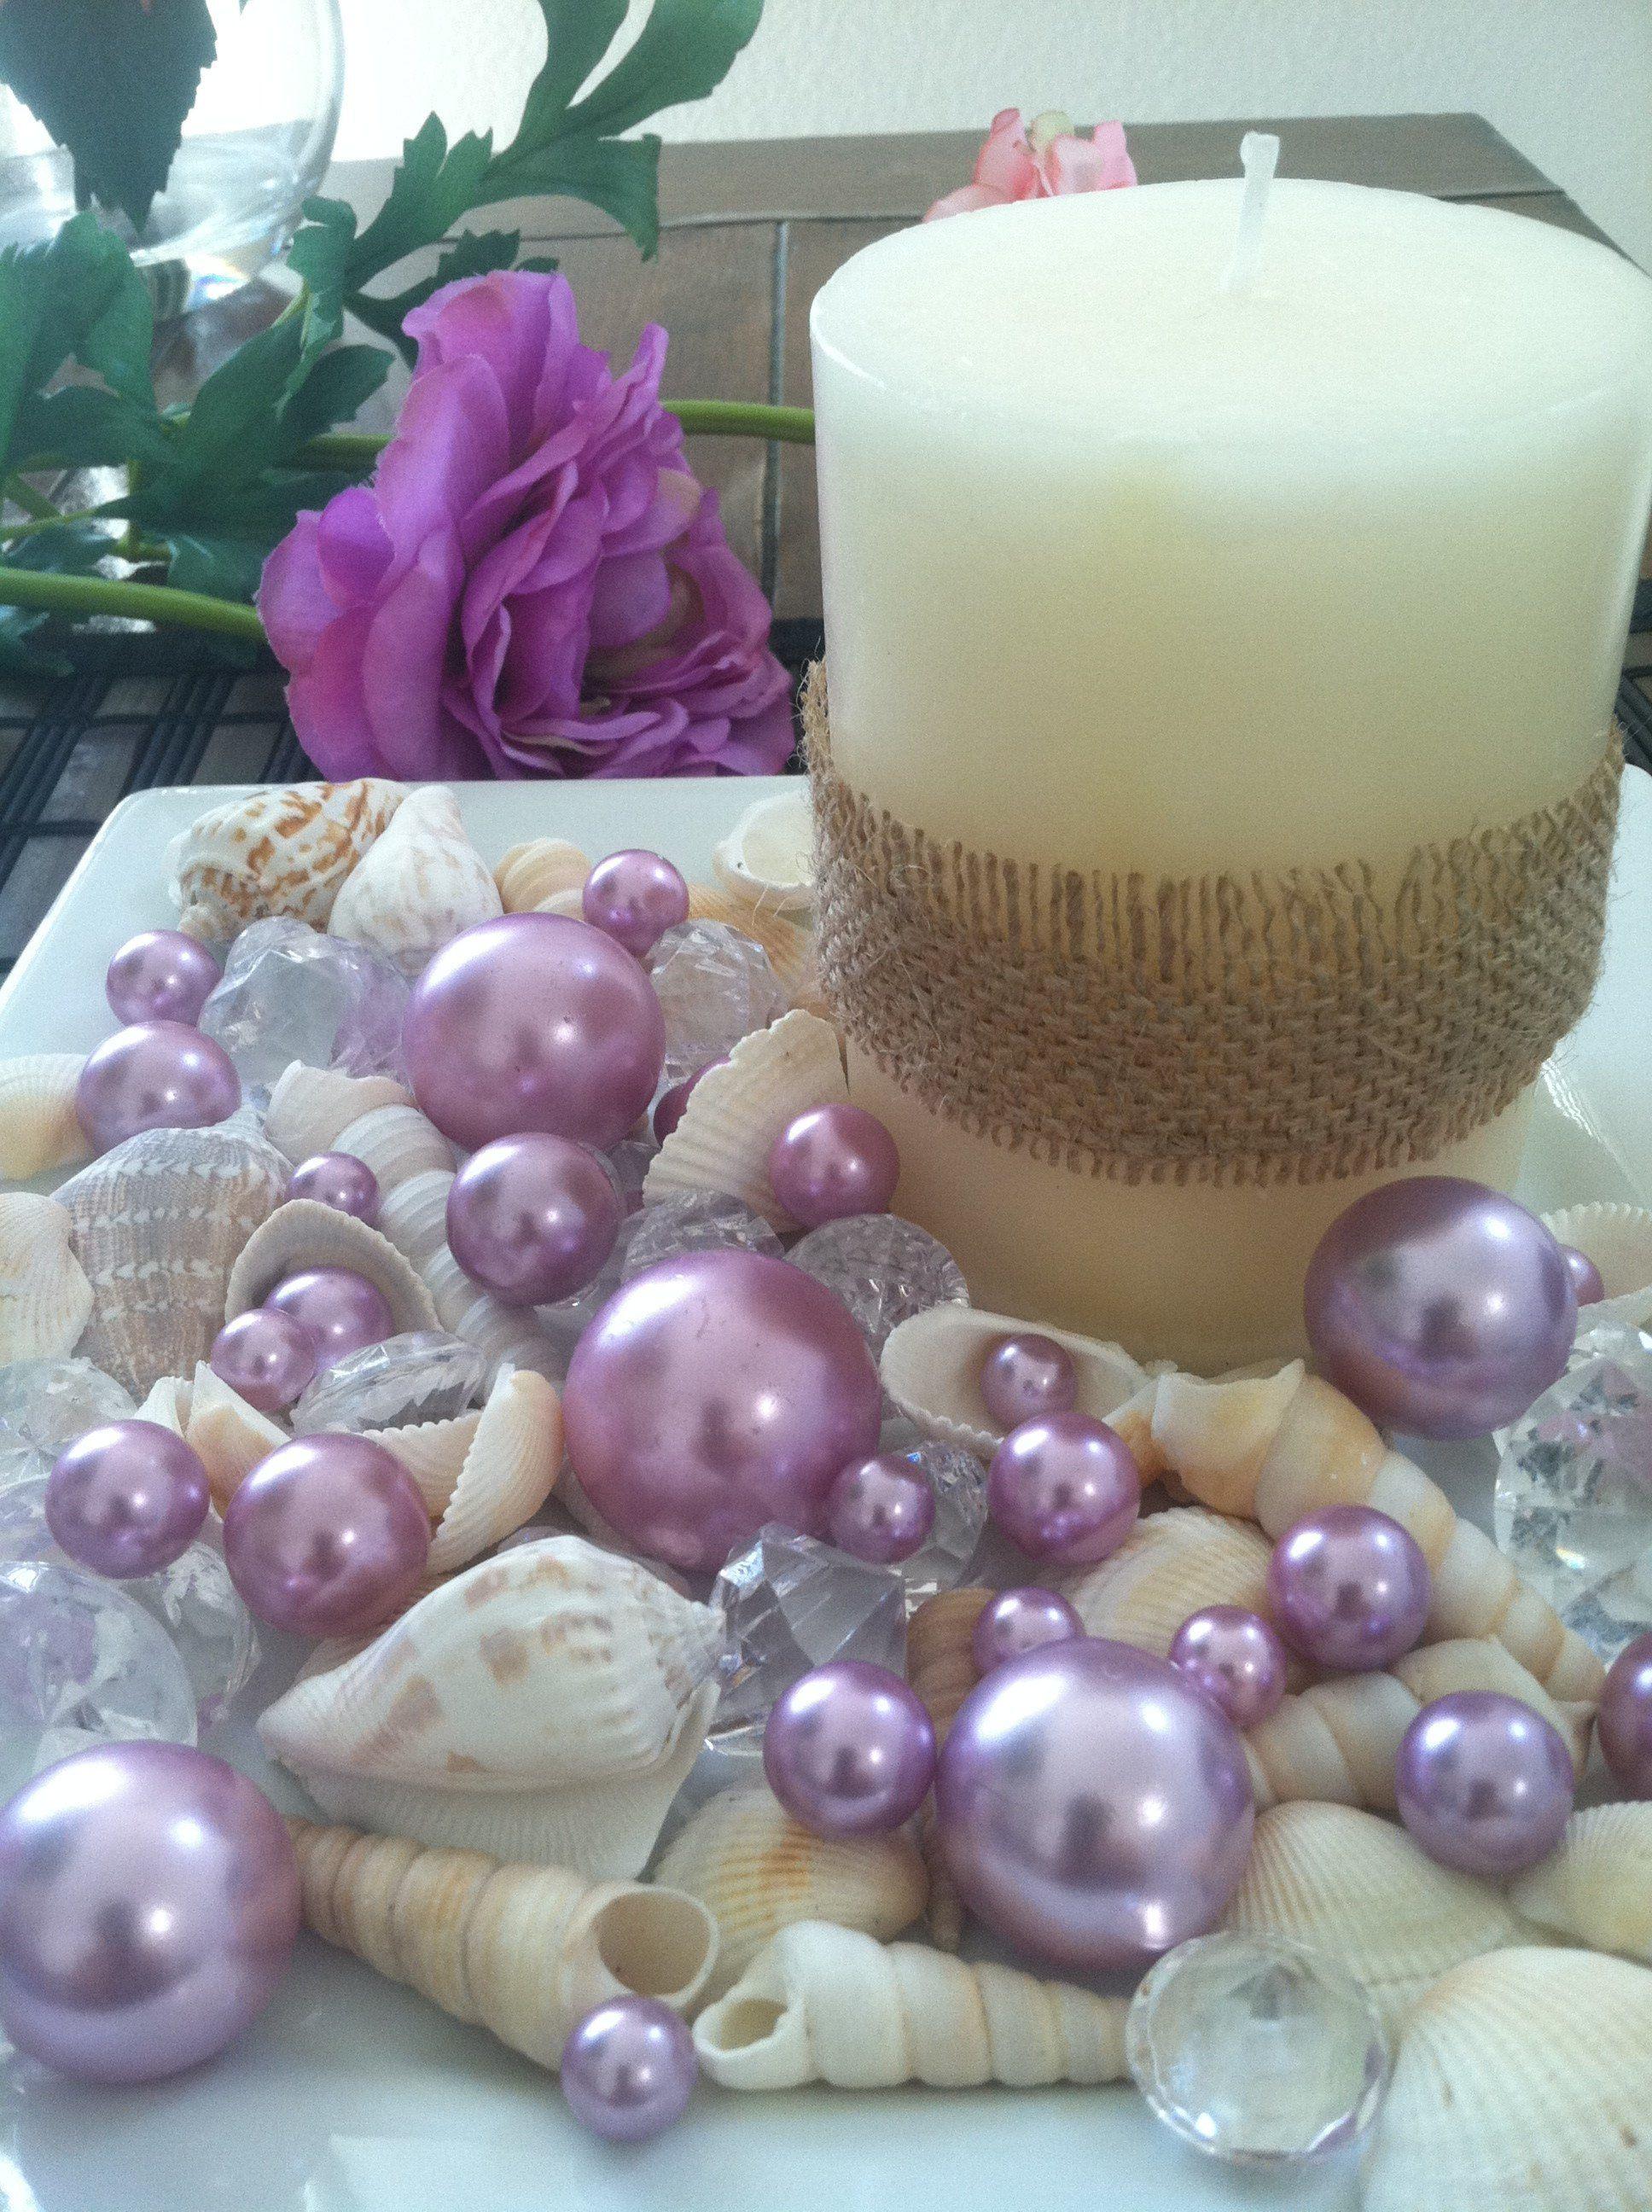 jumbo pearl vase fillers of mix seashells lavendar pearls diamond vase fillers bowl fillers for mix seashells lavendar pearls diamond vase fillers bowl fillers table scatter